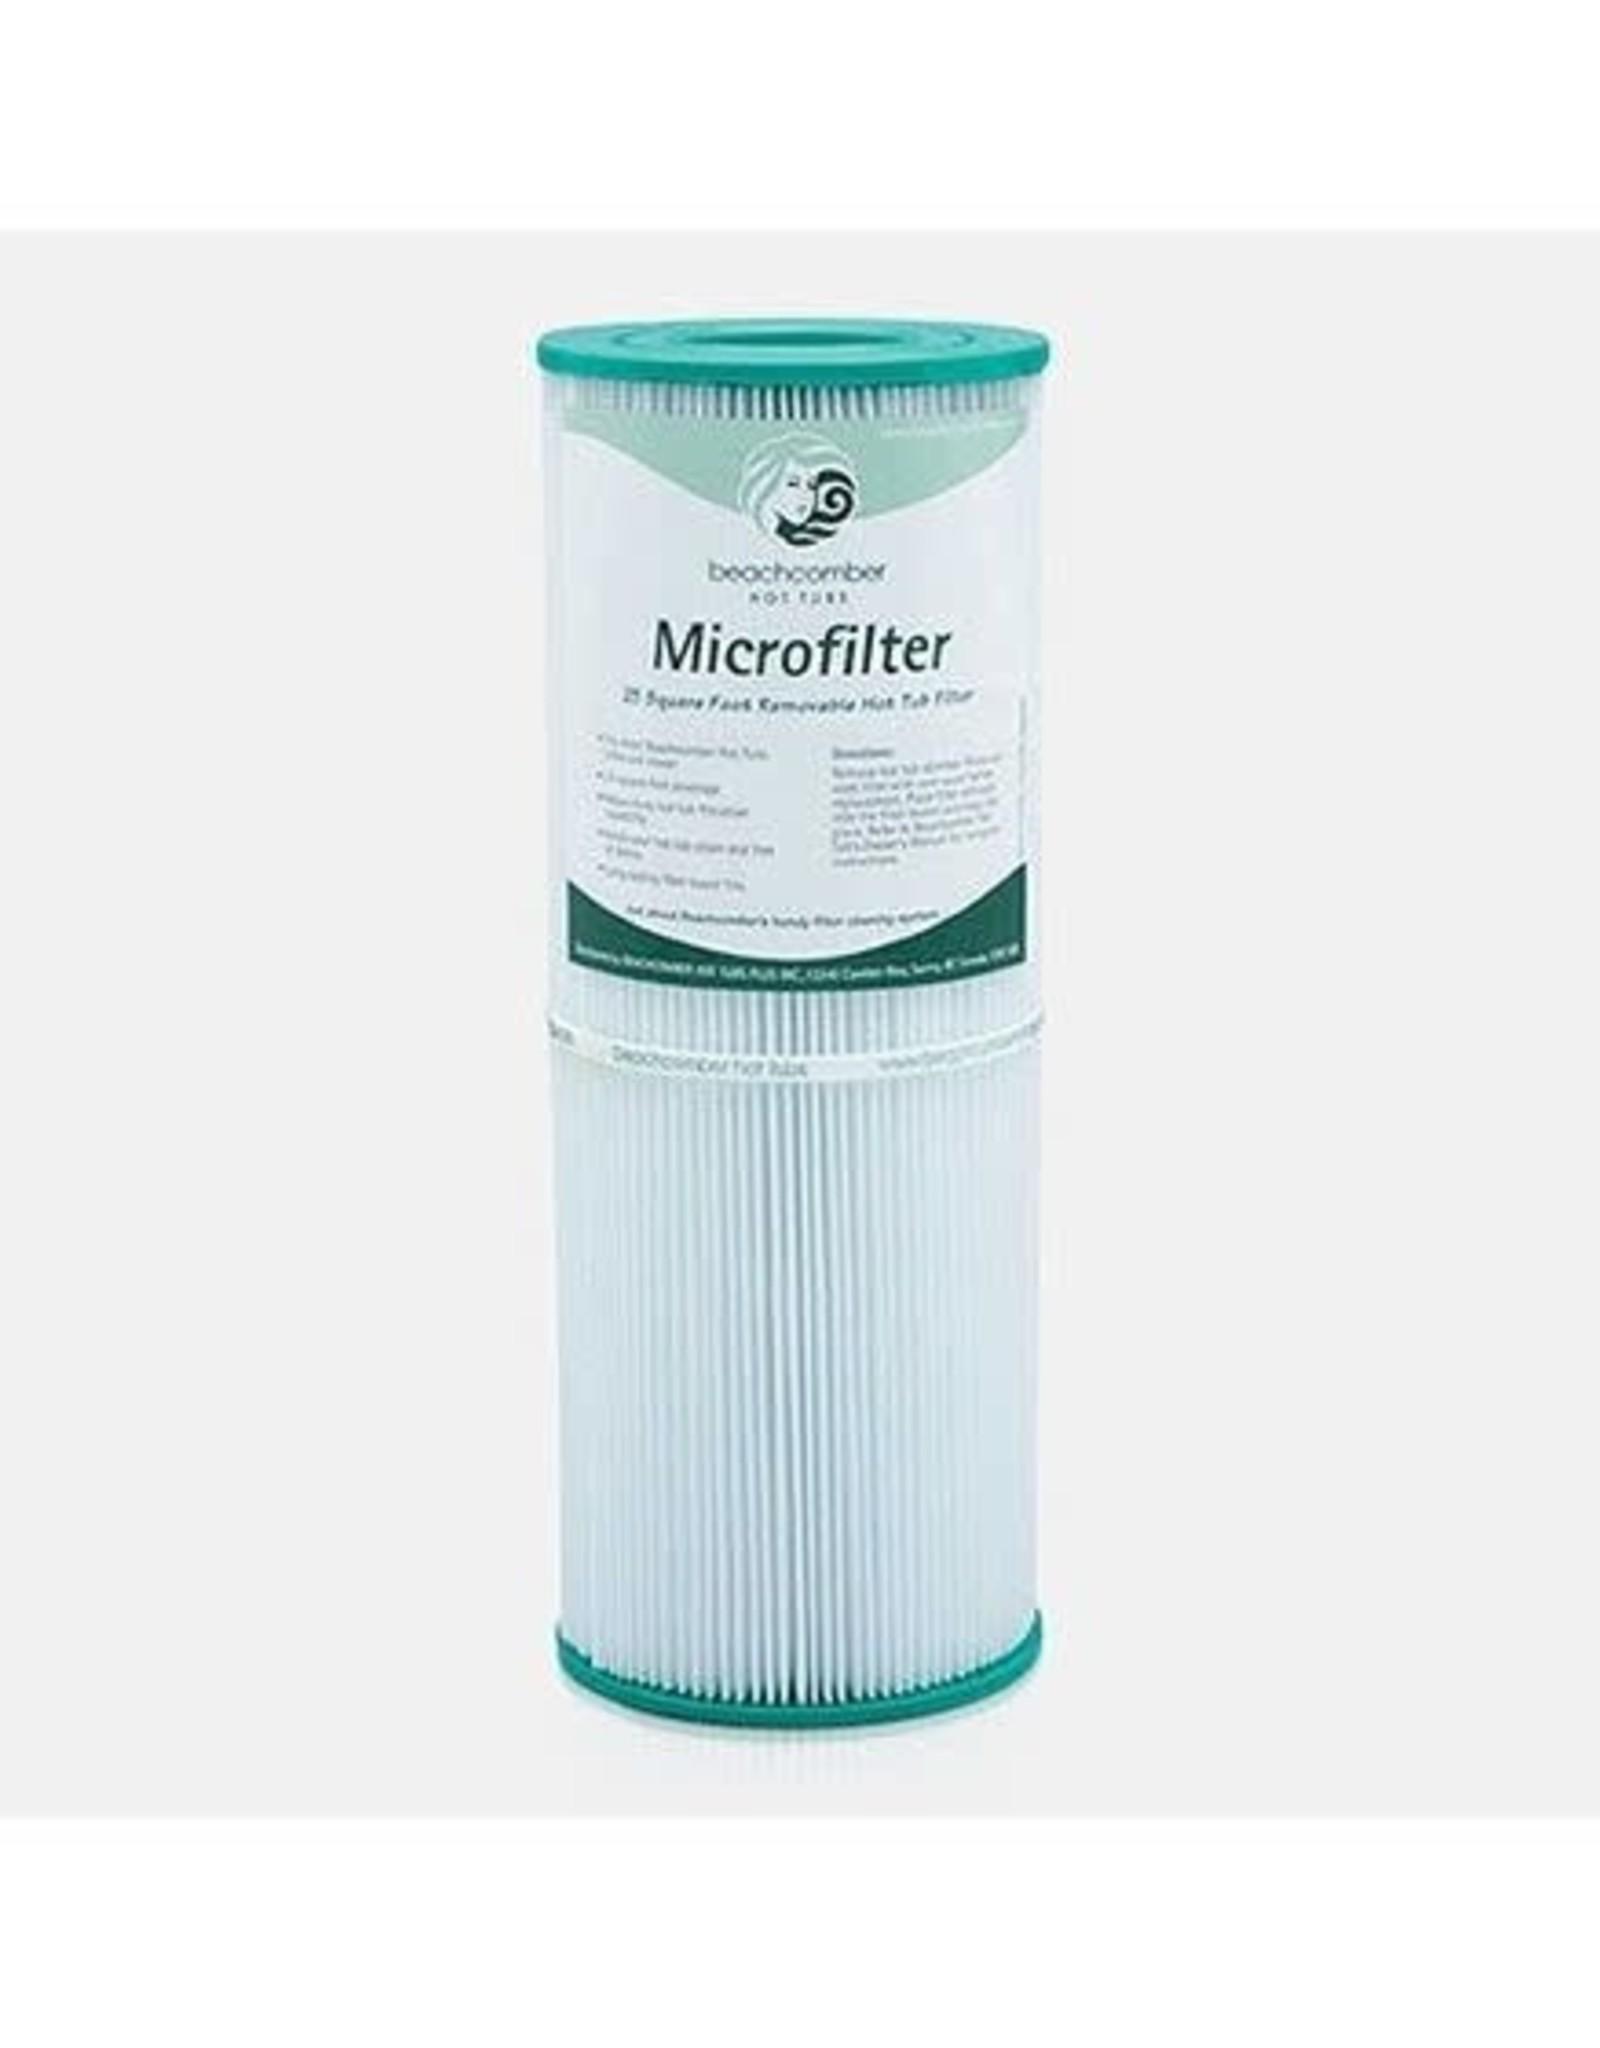 BEACHCOMBER MICROFILTER - 50 SQ FT